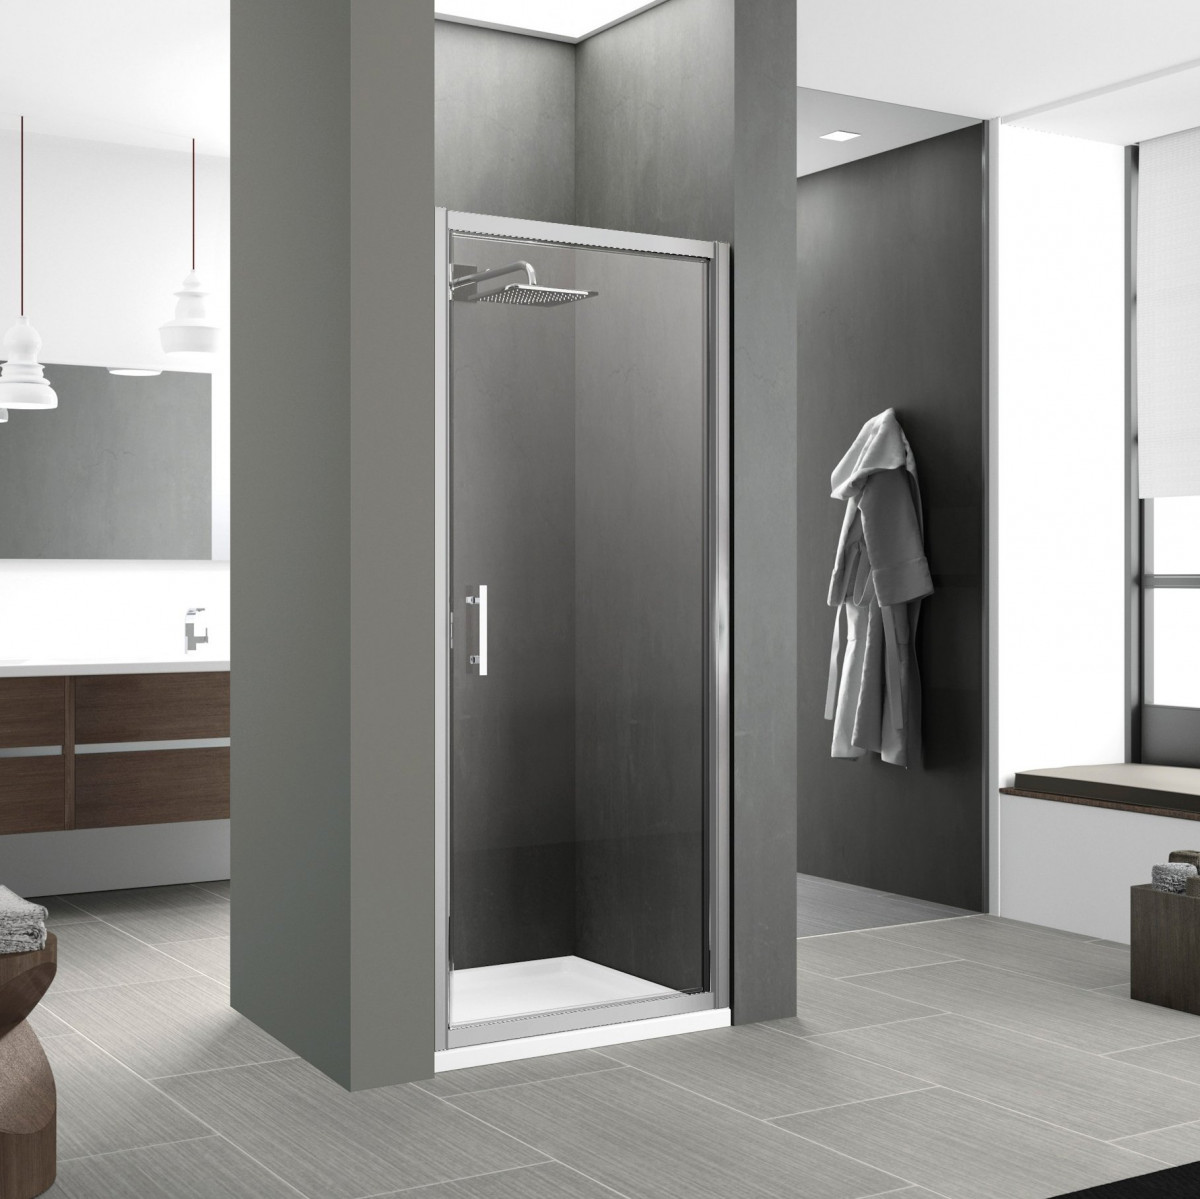 Novellini Zephyros G Hinged Shower Door 700mm